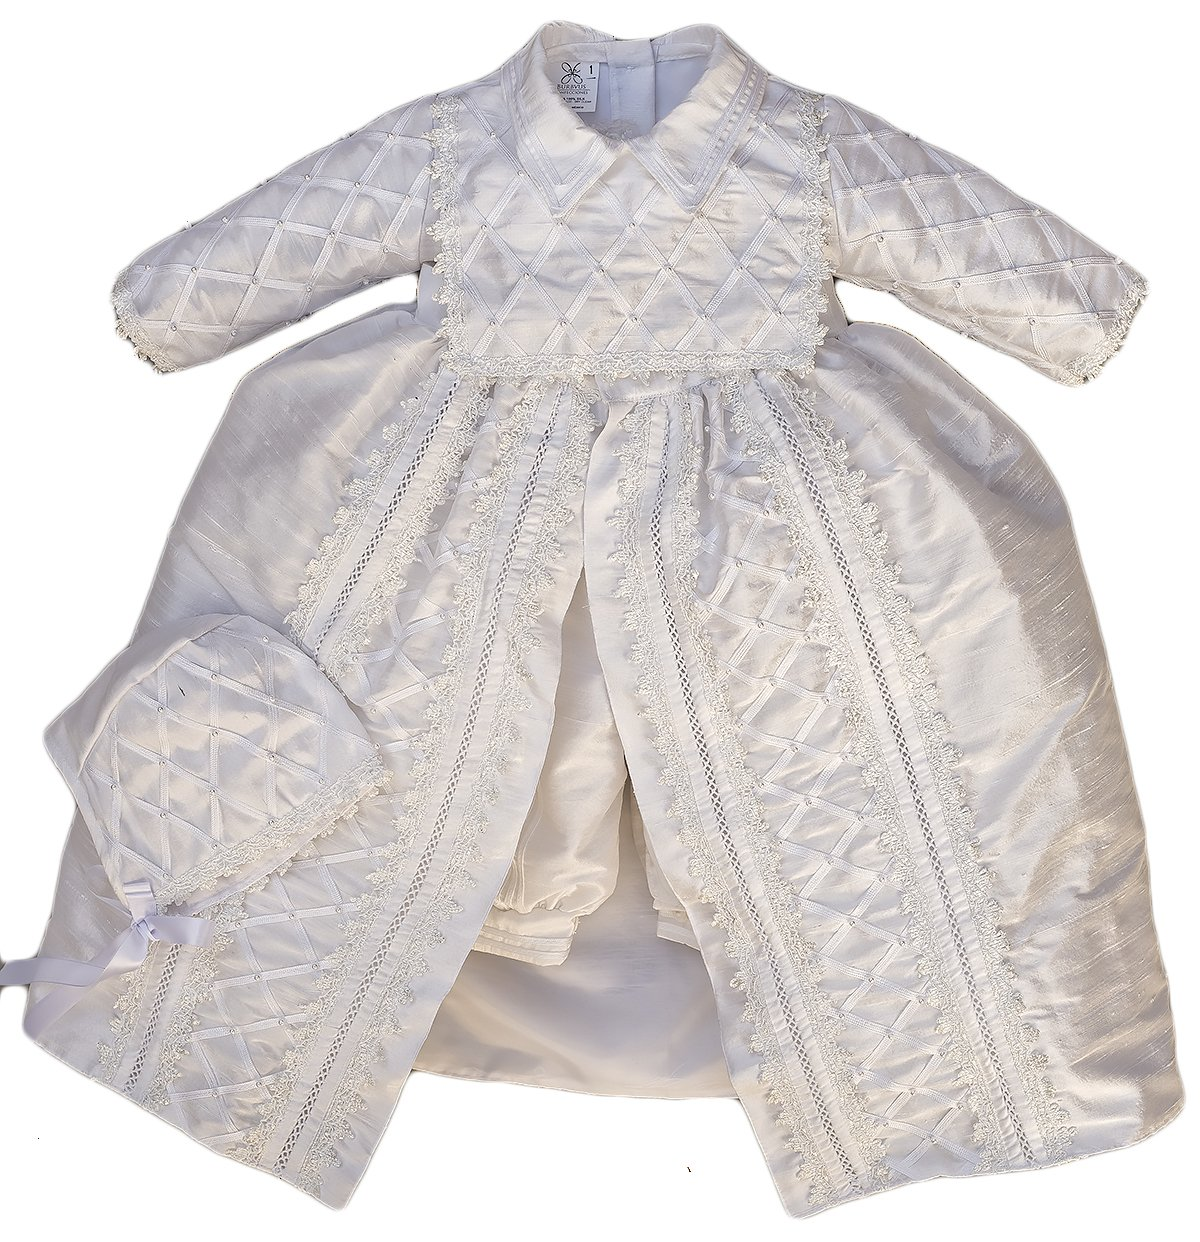 Amazon.com: Boy Christening and Baptism Outfit Ropon Bautizo Burbvus ...